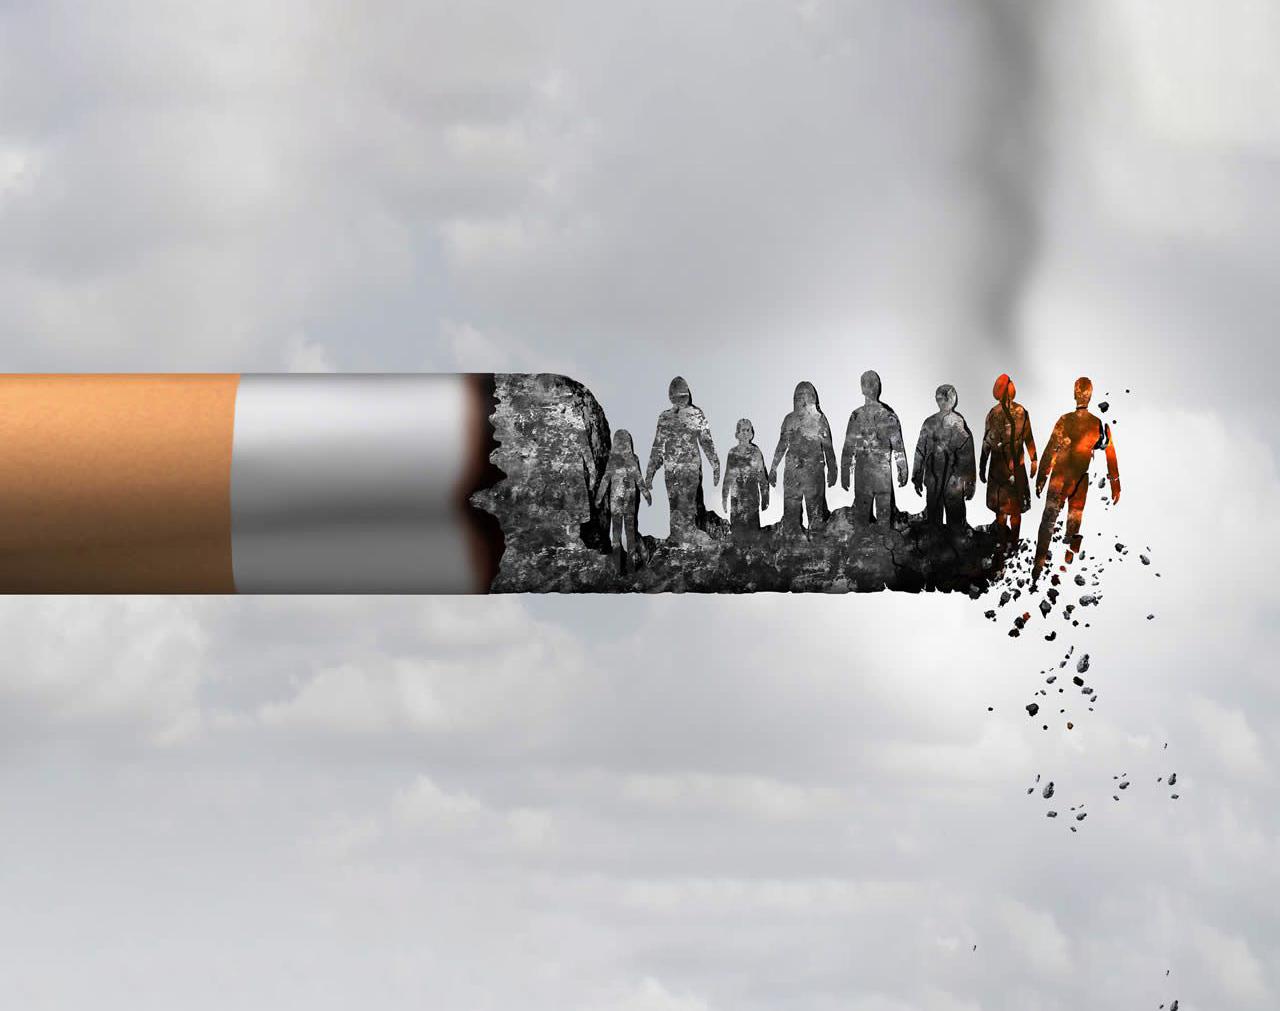 Renuntarea la fumat – cum se poate renunta la fumat?